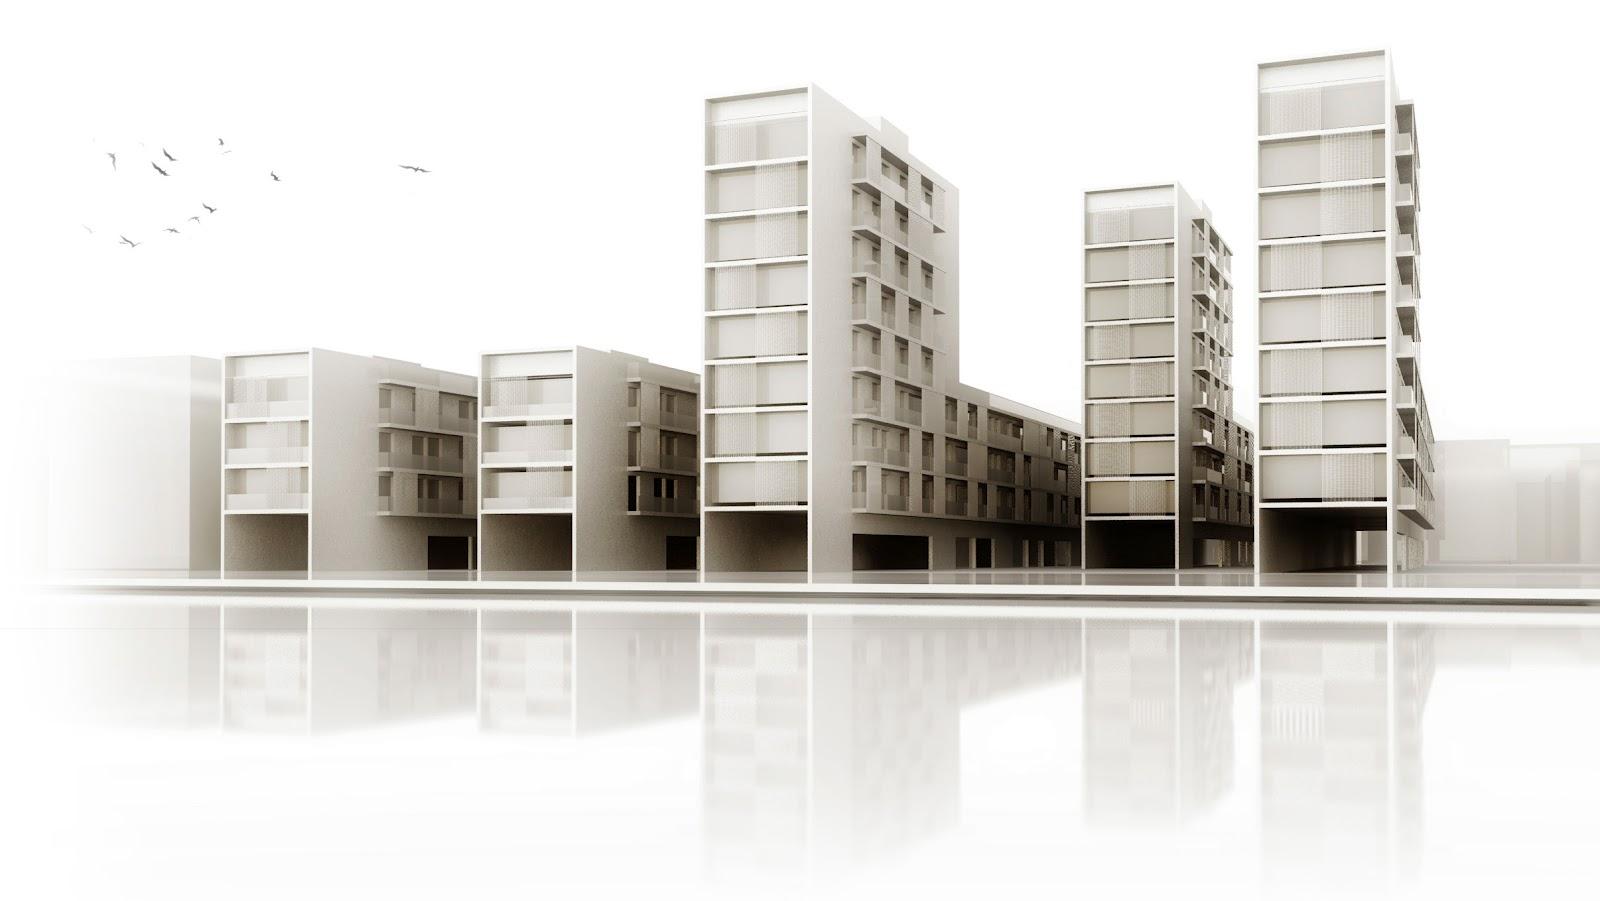 V m arquitectos valencia spain propuesta urbana barrio de - Arquitectos lorca ...